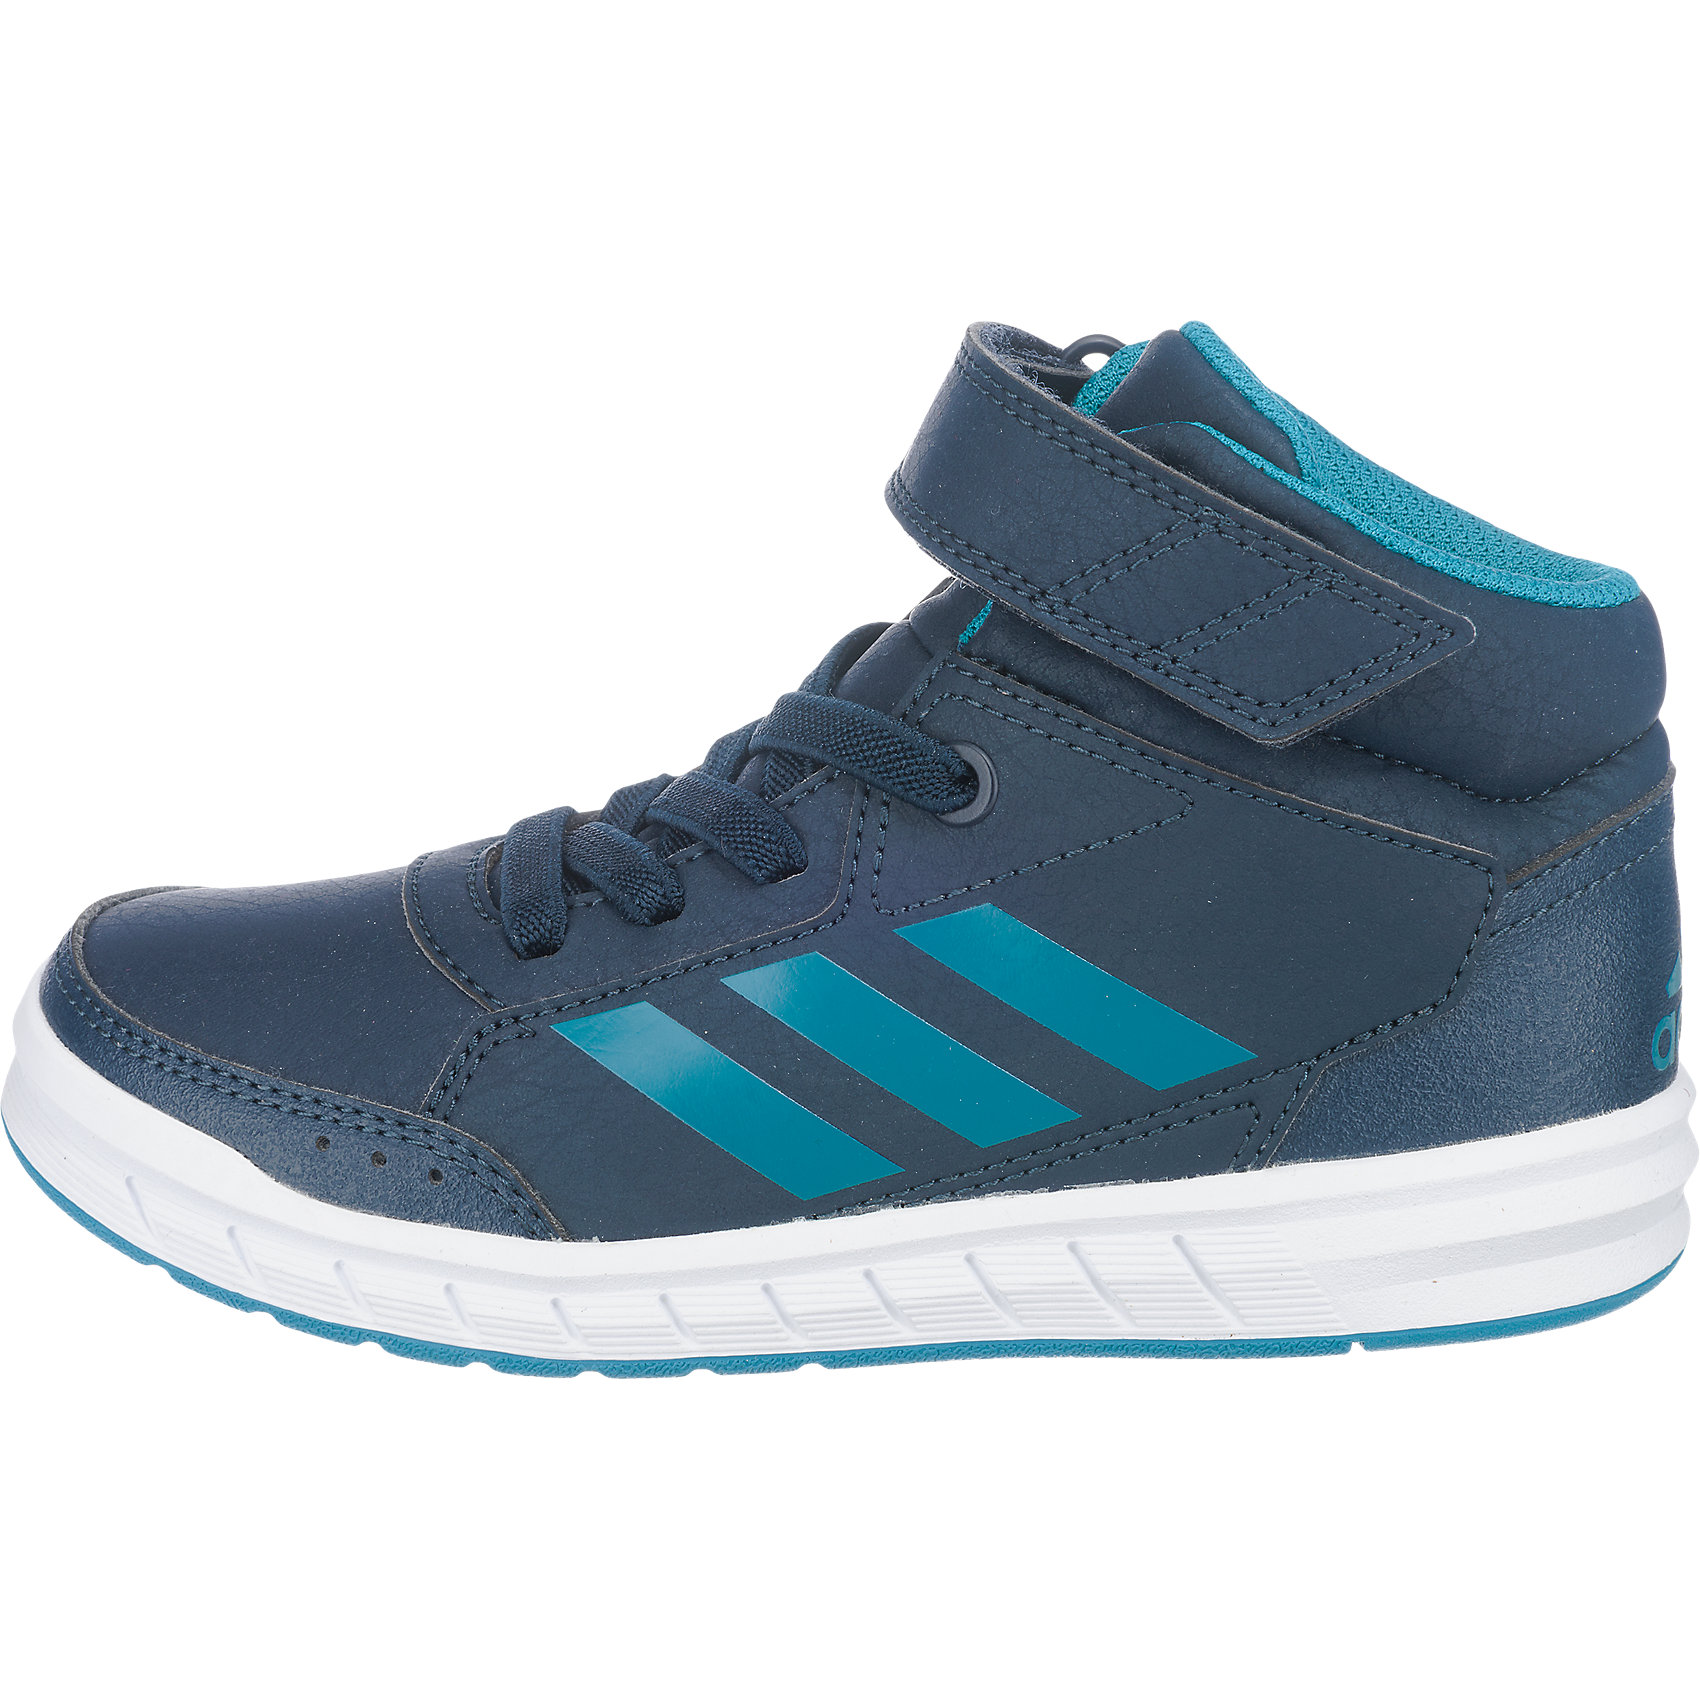 f58835000d87c5 Neu adidas Performance Sneakers High AltaSport Mid EL K für Jungen ...